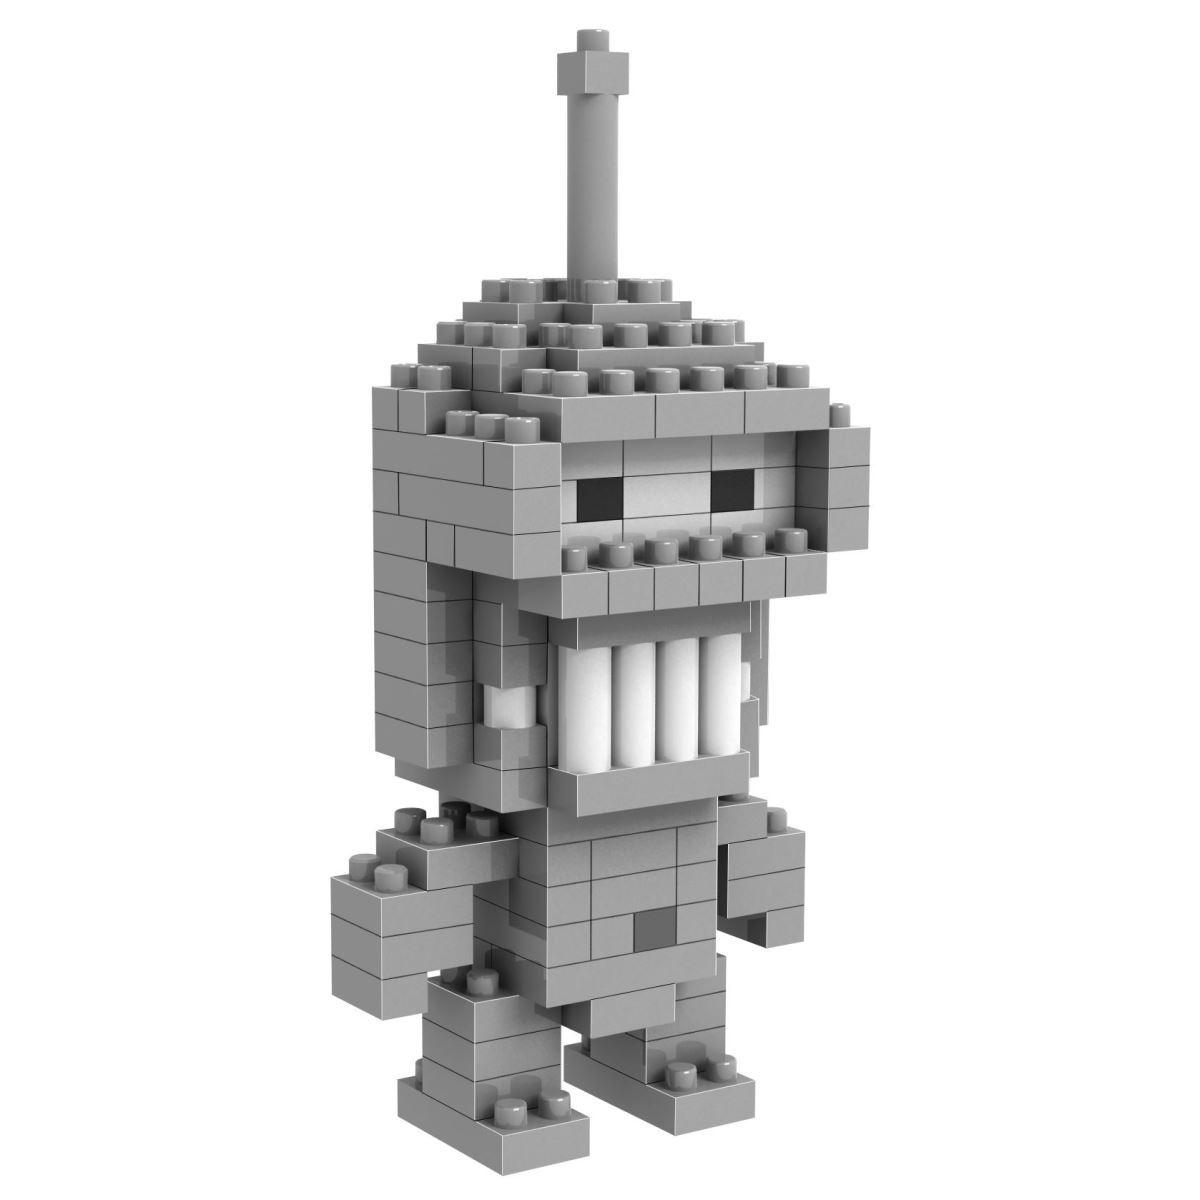 Loz Мини-конструктор Diamond Block Робот Бендер loz creator mini diamond building block space shuttle launch center scene nanoblock model bricks educational toys collection